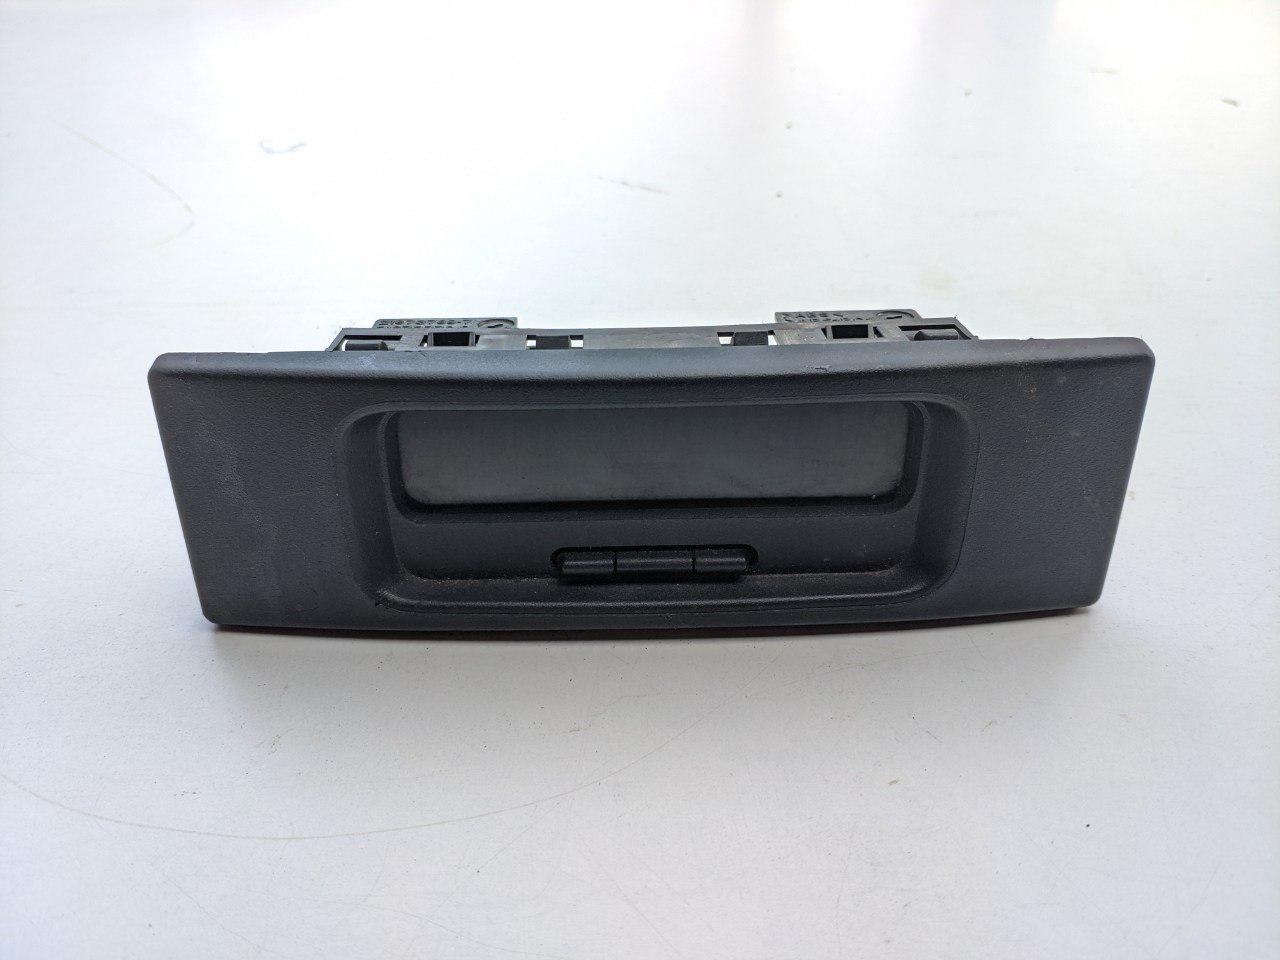 Дисплей (екран, табло) Renault Trafic, Nissan Primastar 2001-2014, 8200584888 (Б/У)